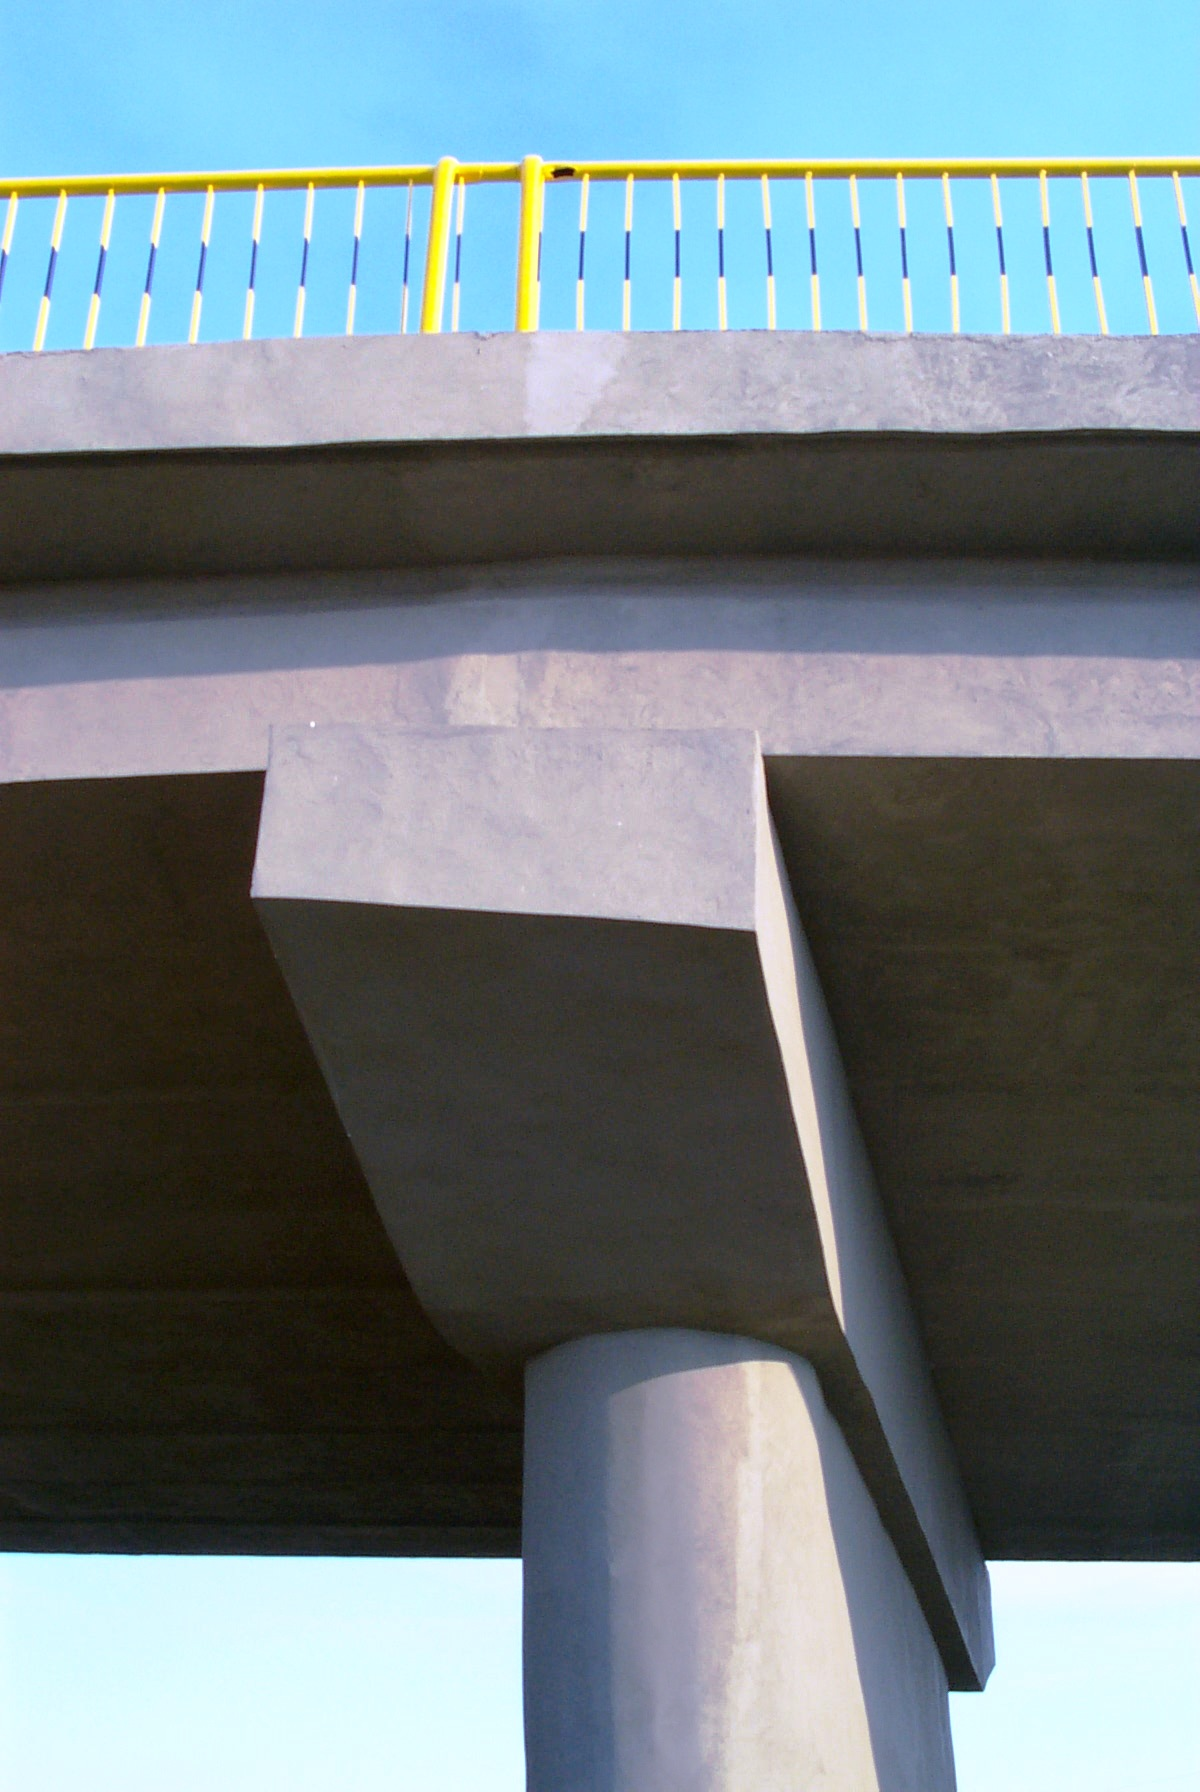 Reparatii pod (DN2), Km. 33 - 028, peste raul Calnistea MAPEI - Poza 25